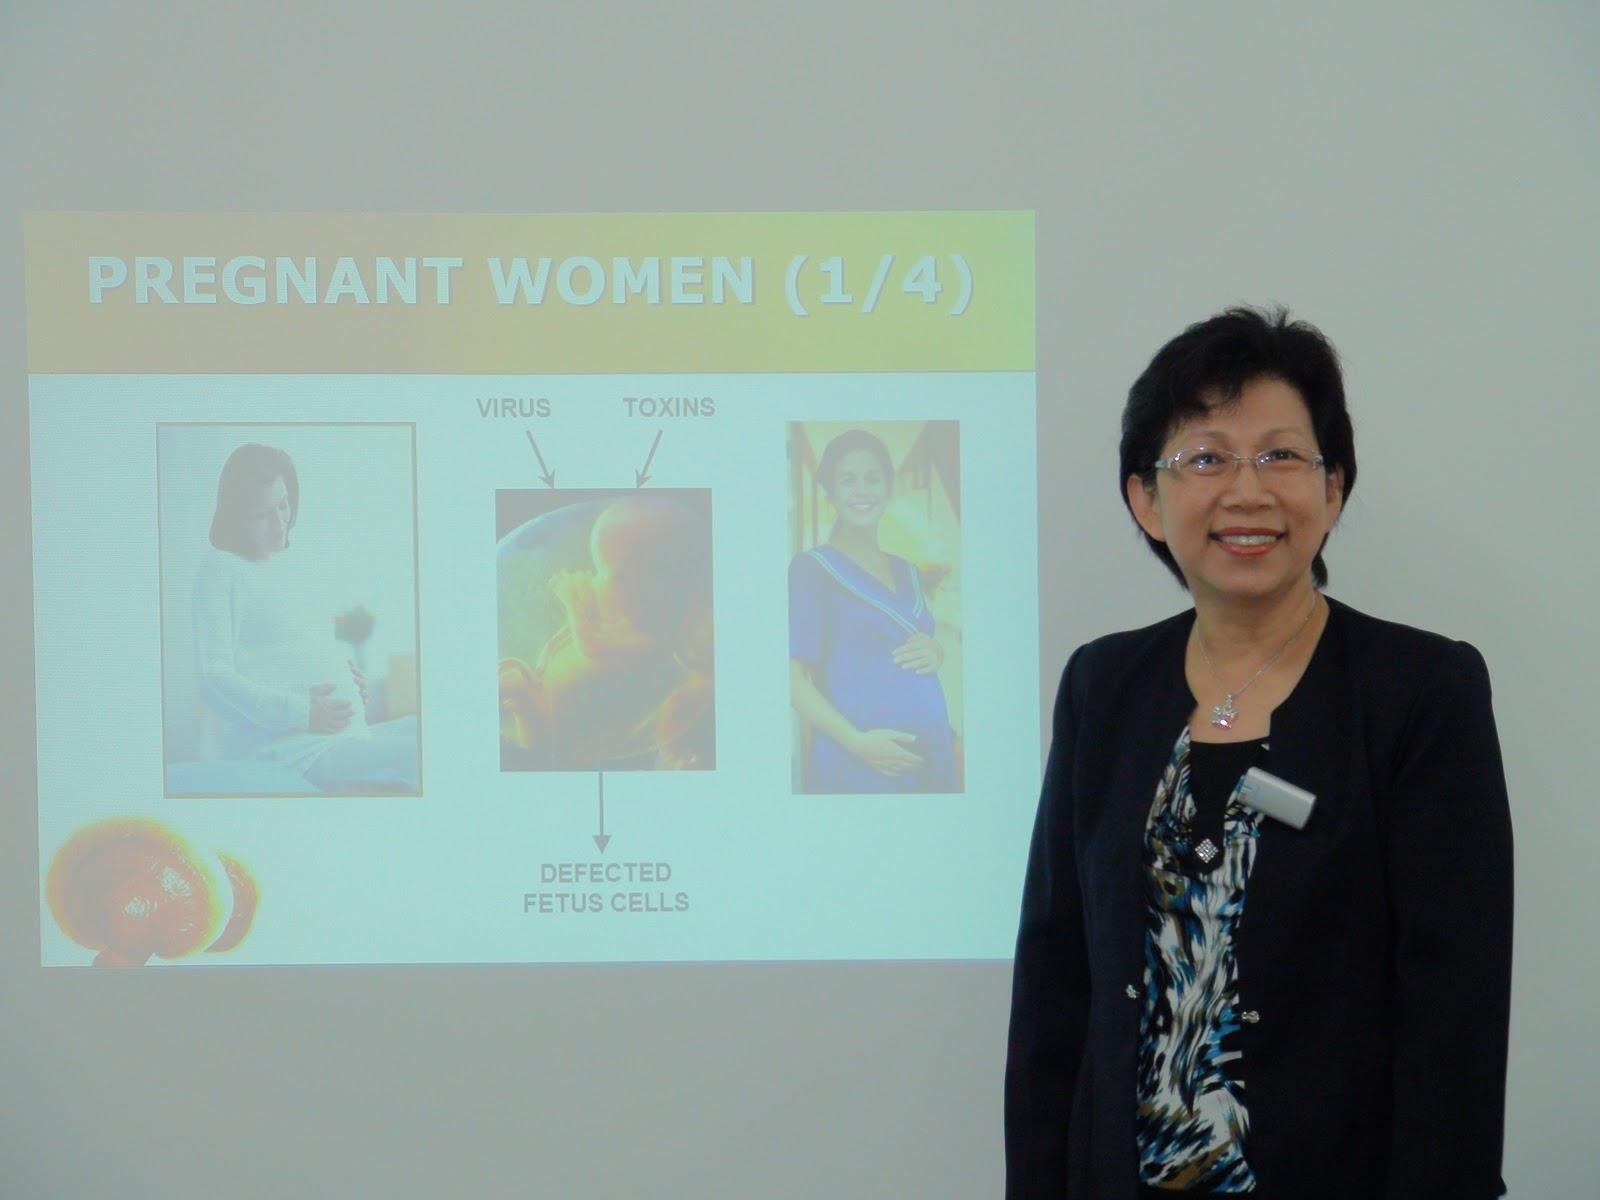 Dr. Jane Yau